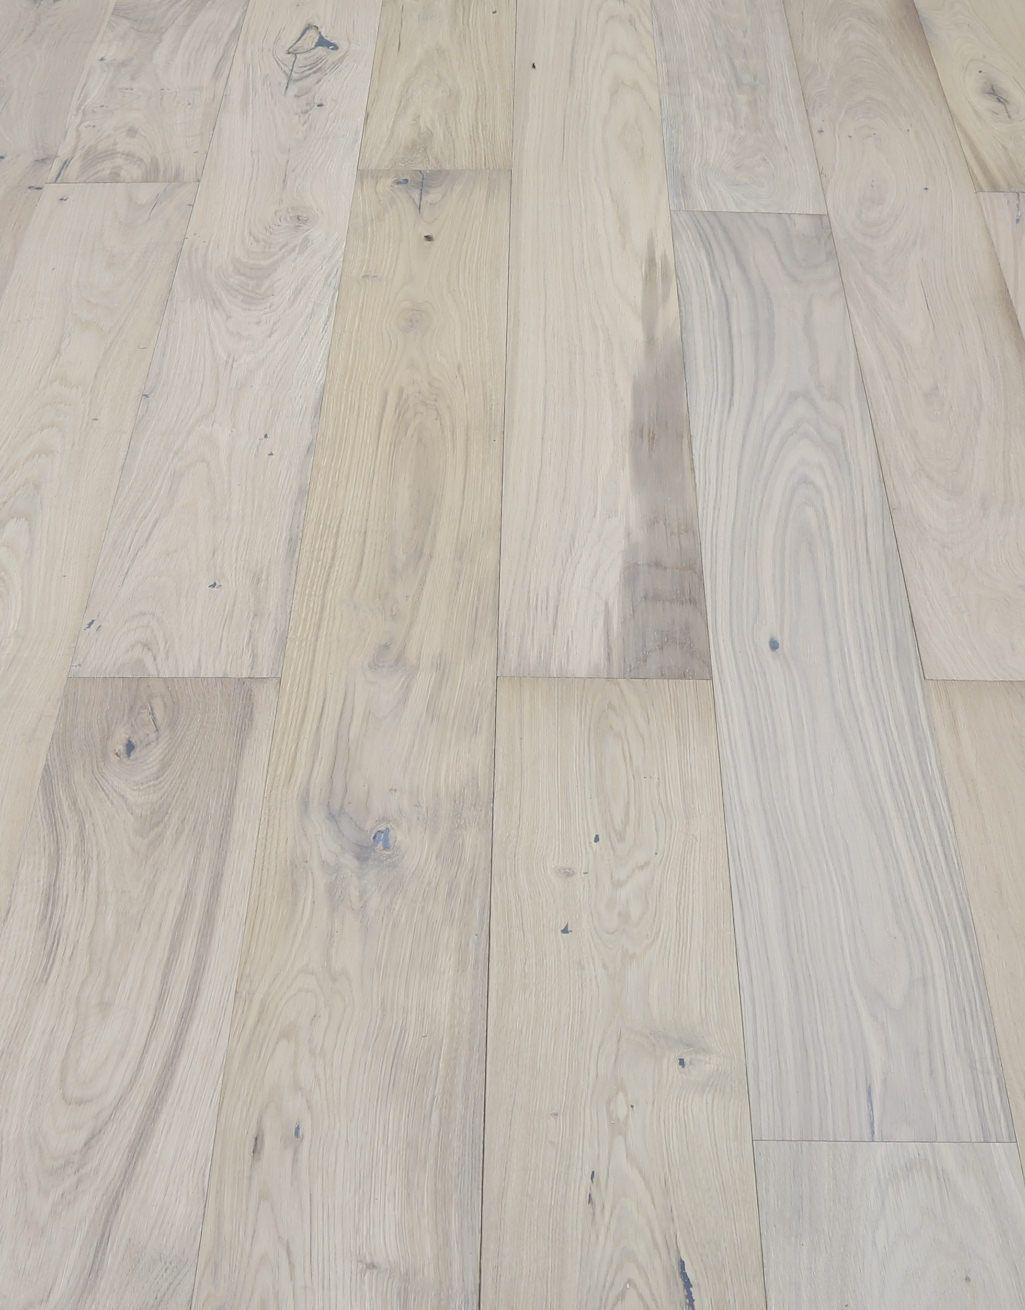 Manhattan Abbey Oak Brushed Oiled Engineered Wood Flooring Engineered Wood Floors Engineered Wood Engineered Wood Floors Oak